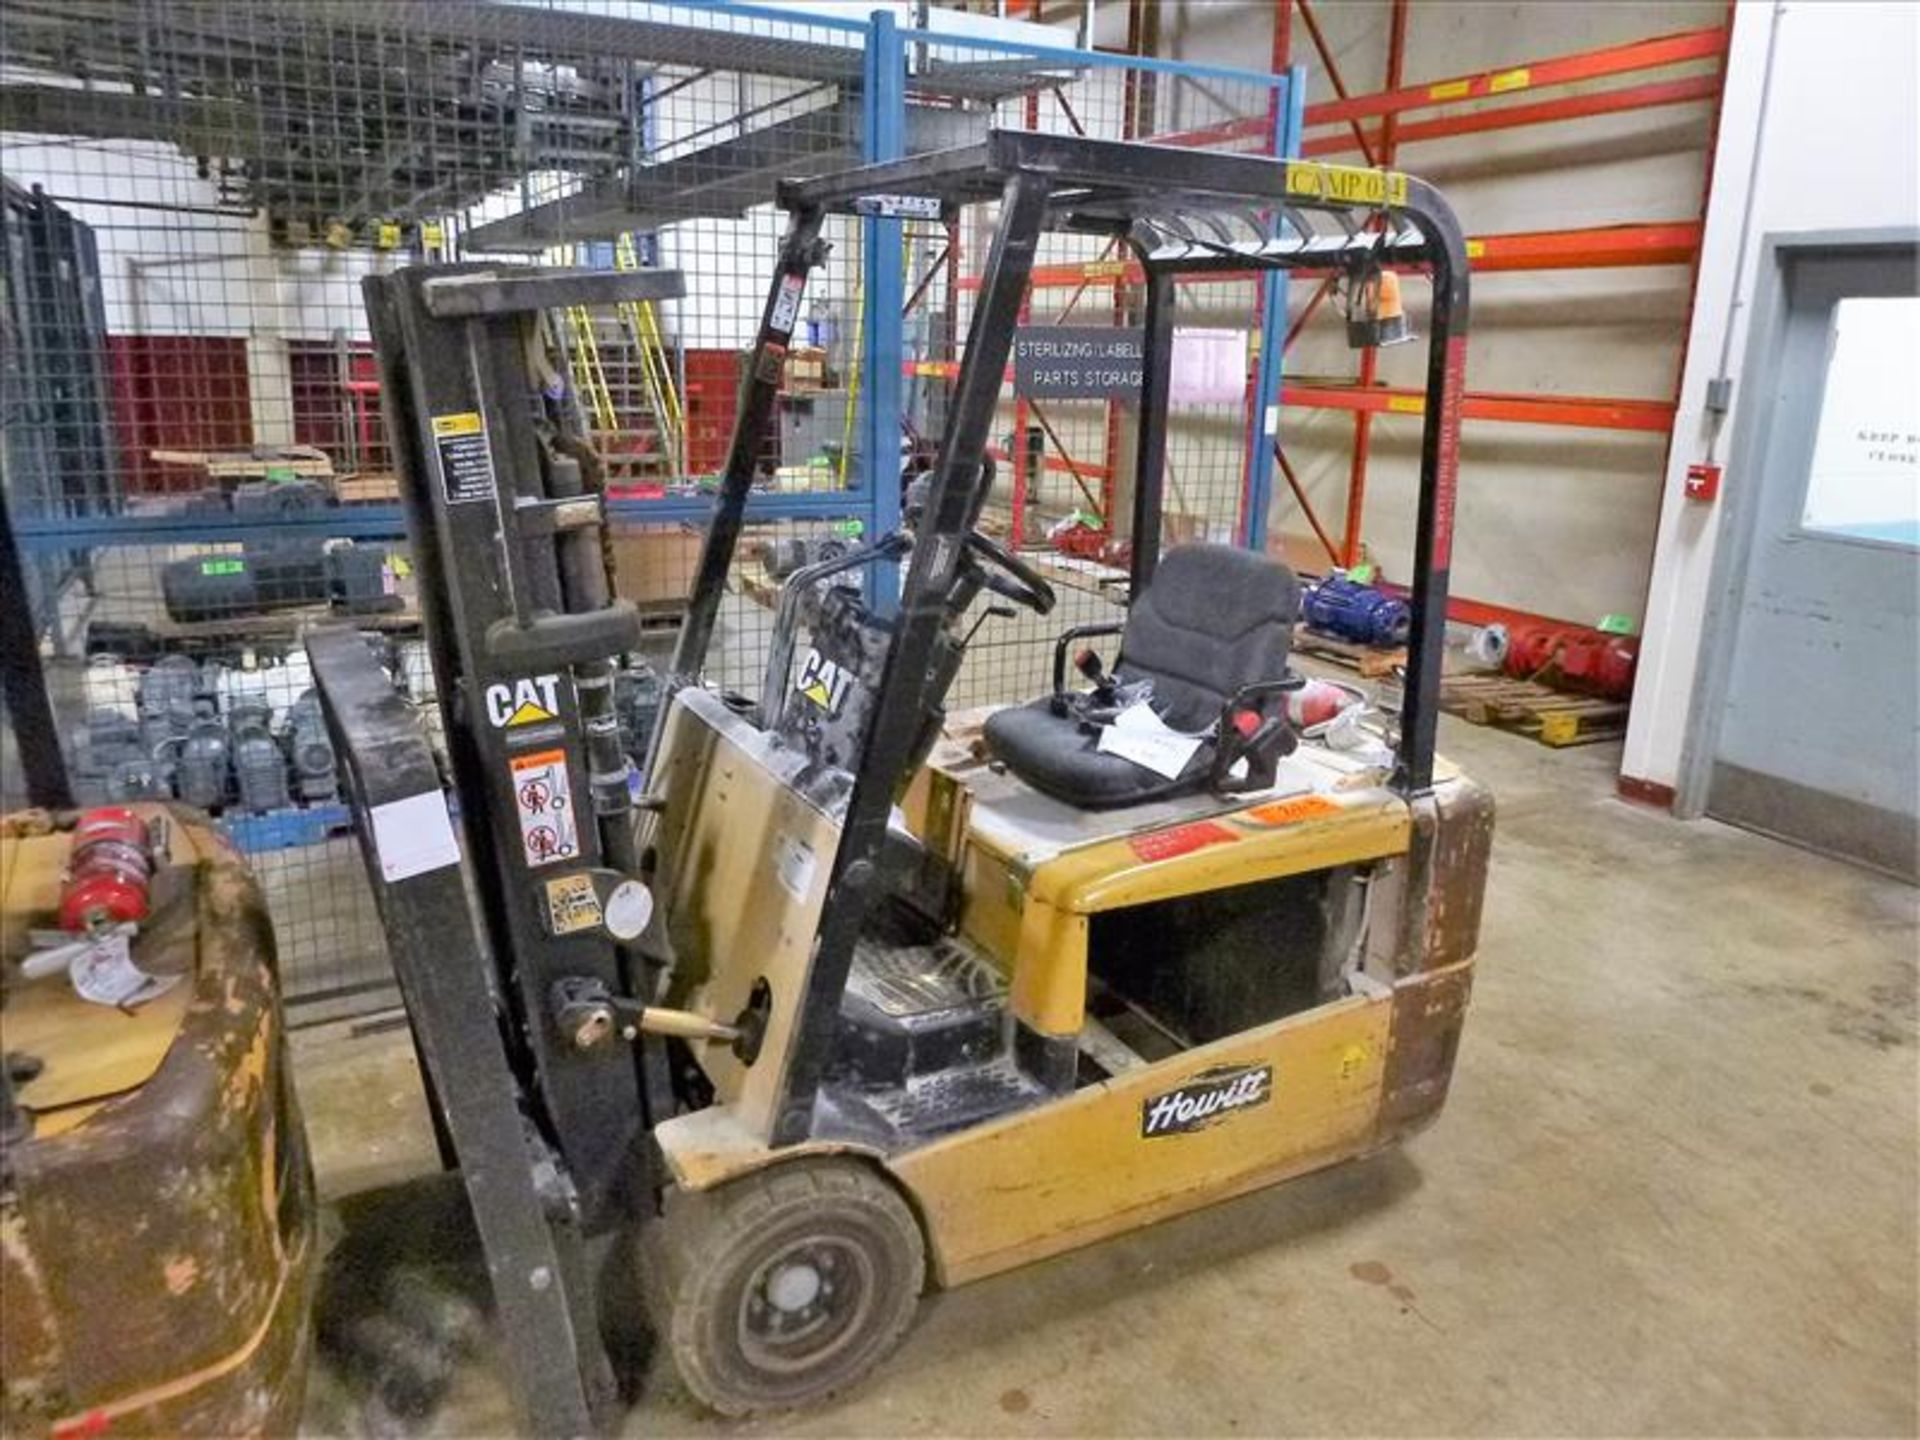 Lot 2020B - Caterpillar fork lift truck, mod. EC20KT, ser. no. ETB5B52166, 48V electric, 3750 lbs cap., 159